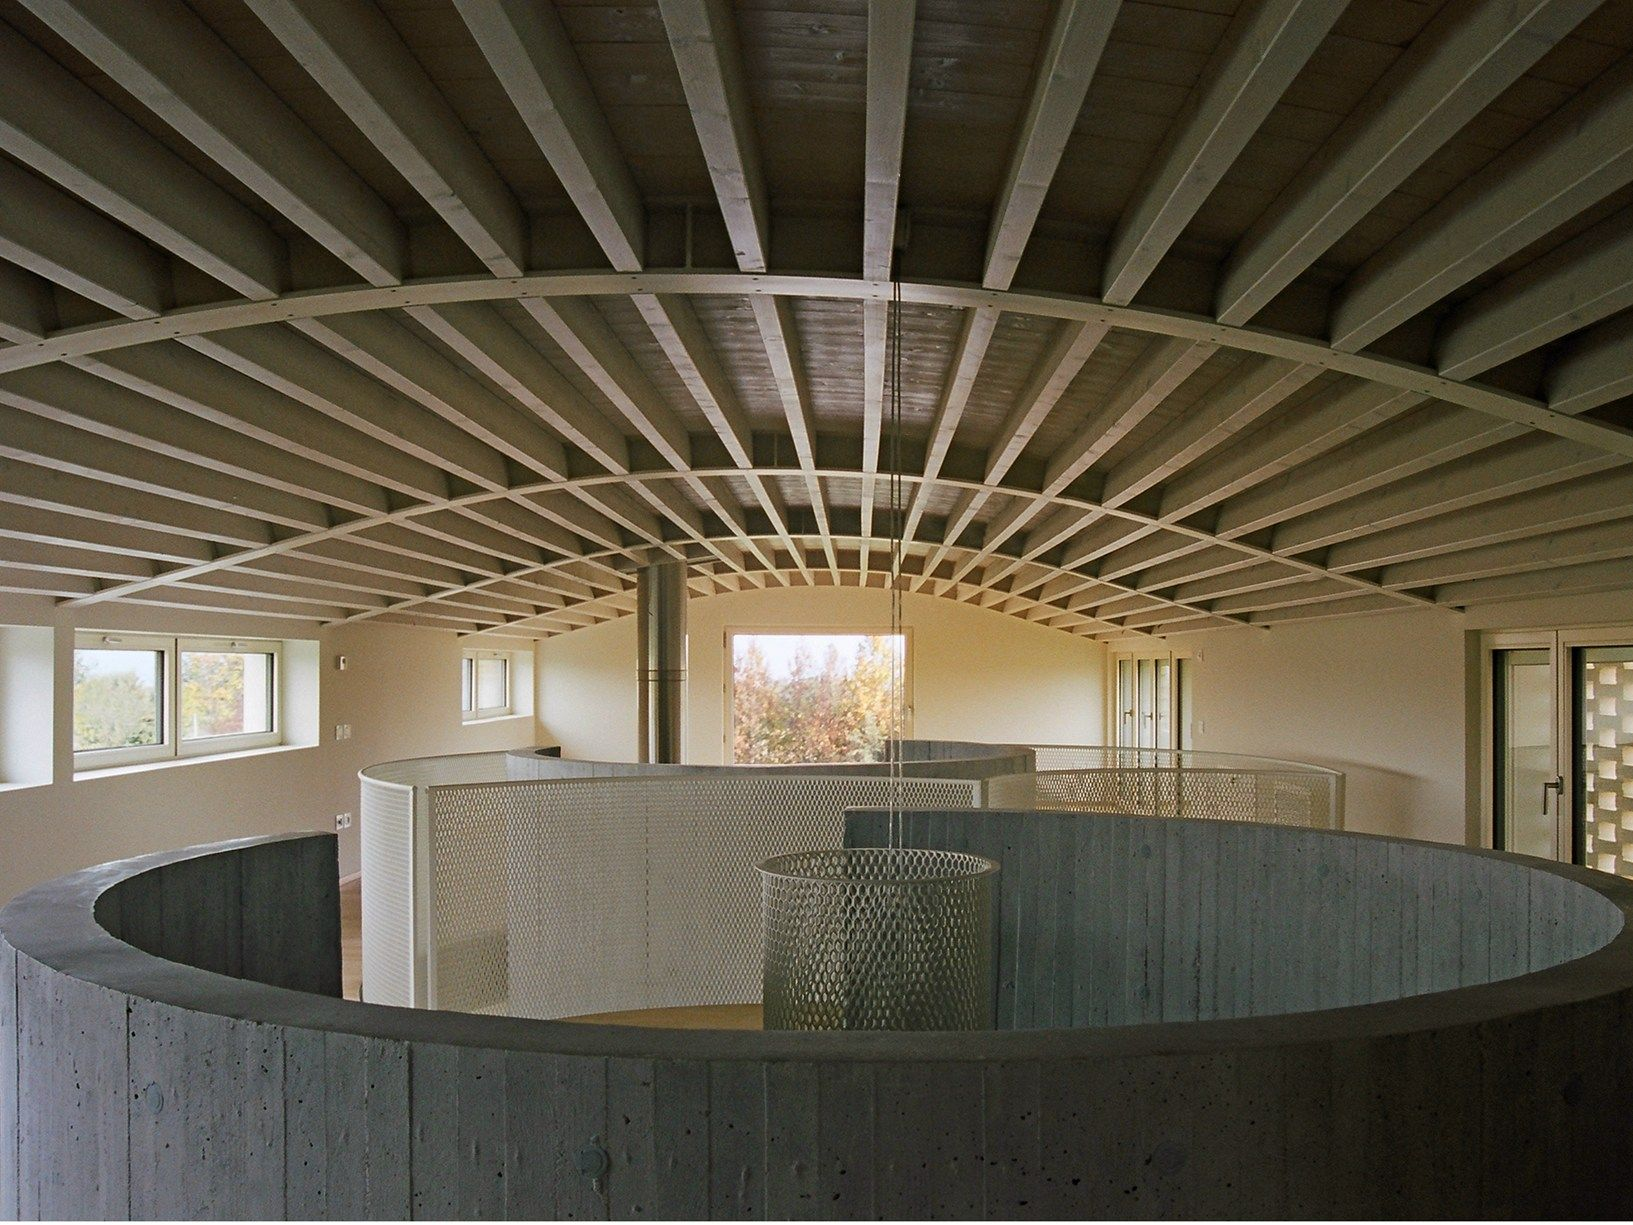 A Sacile la moderna country house di Elasticospa ed Elastico3